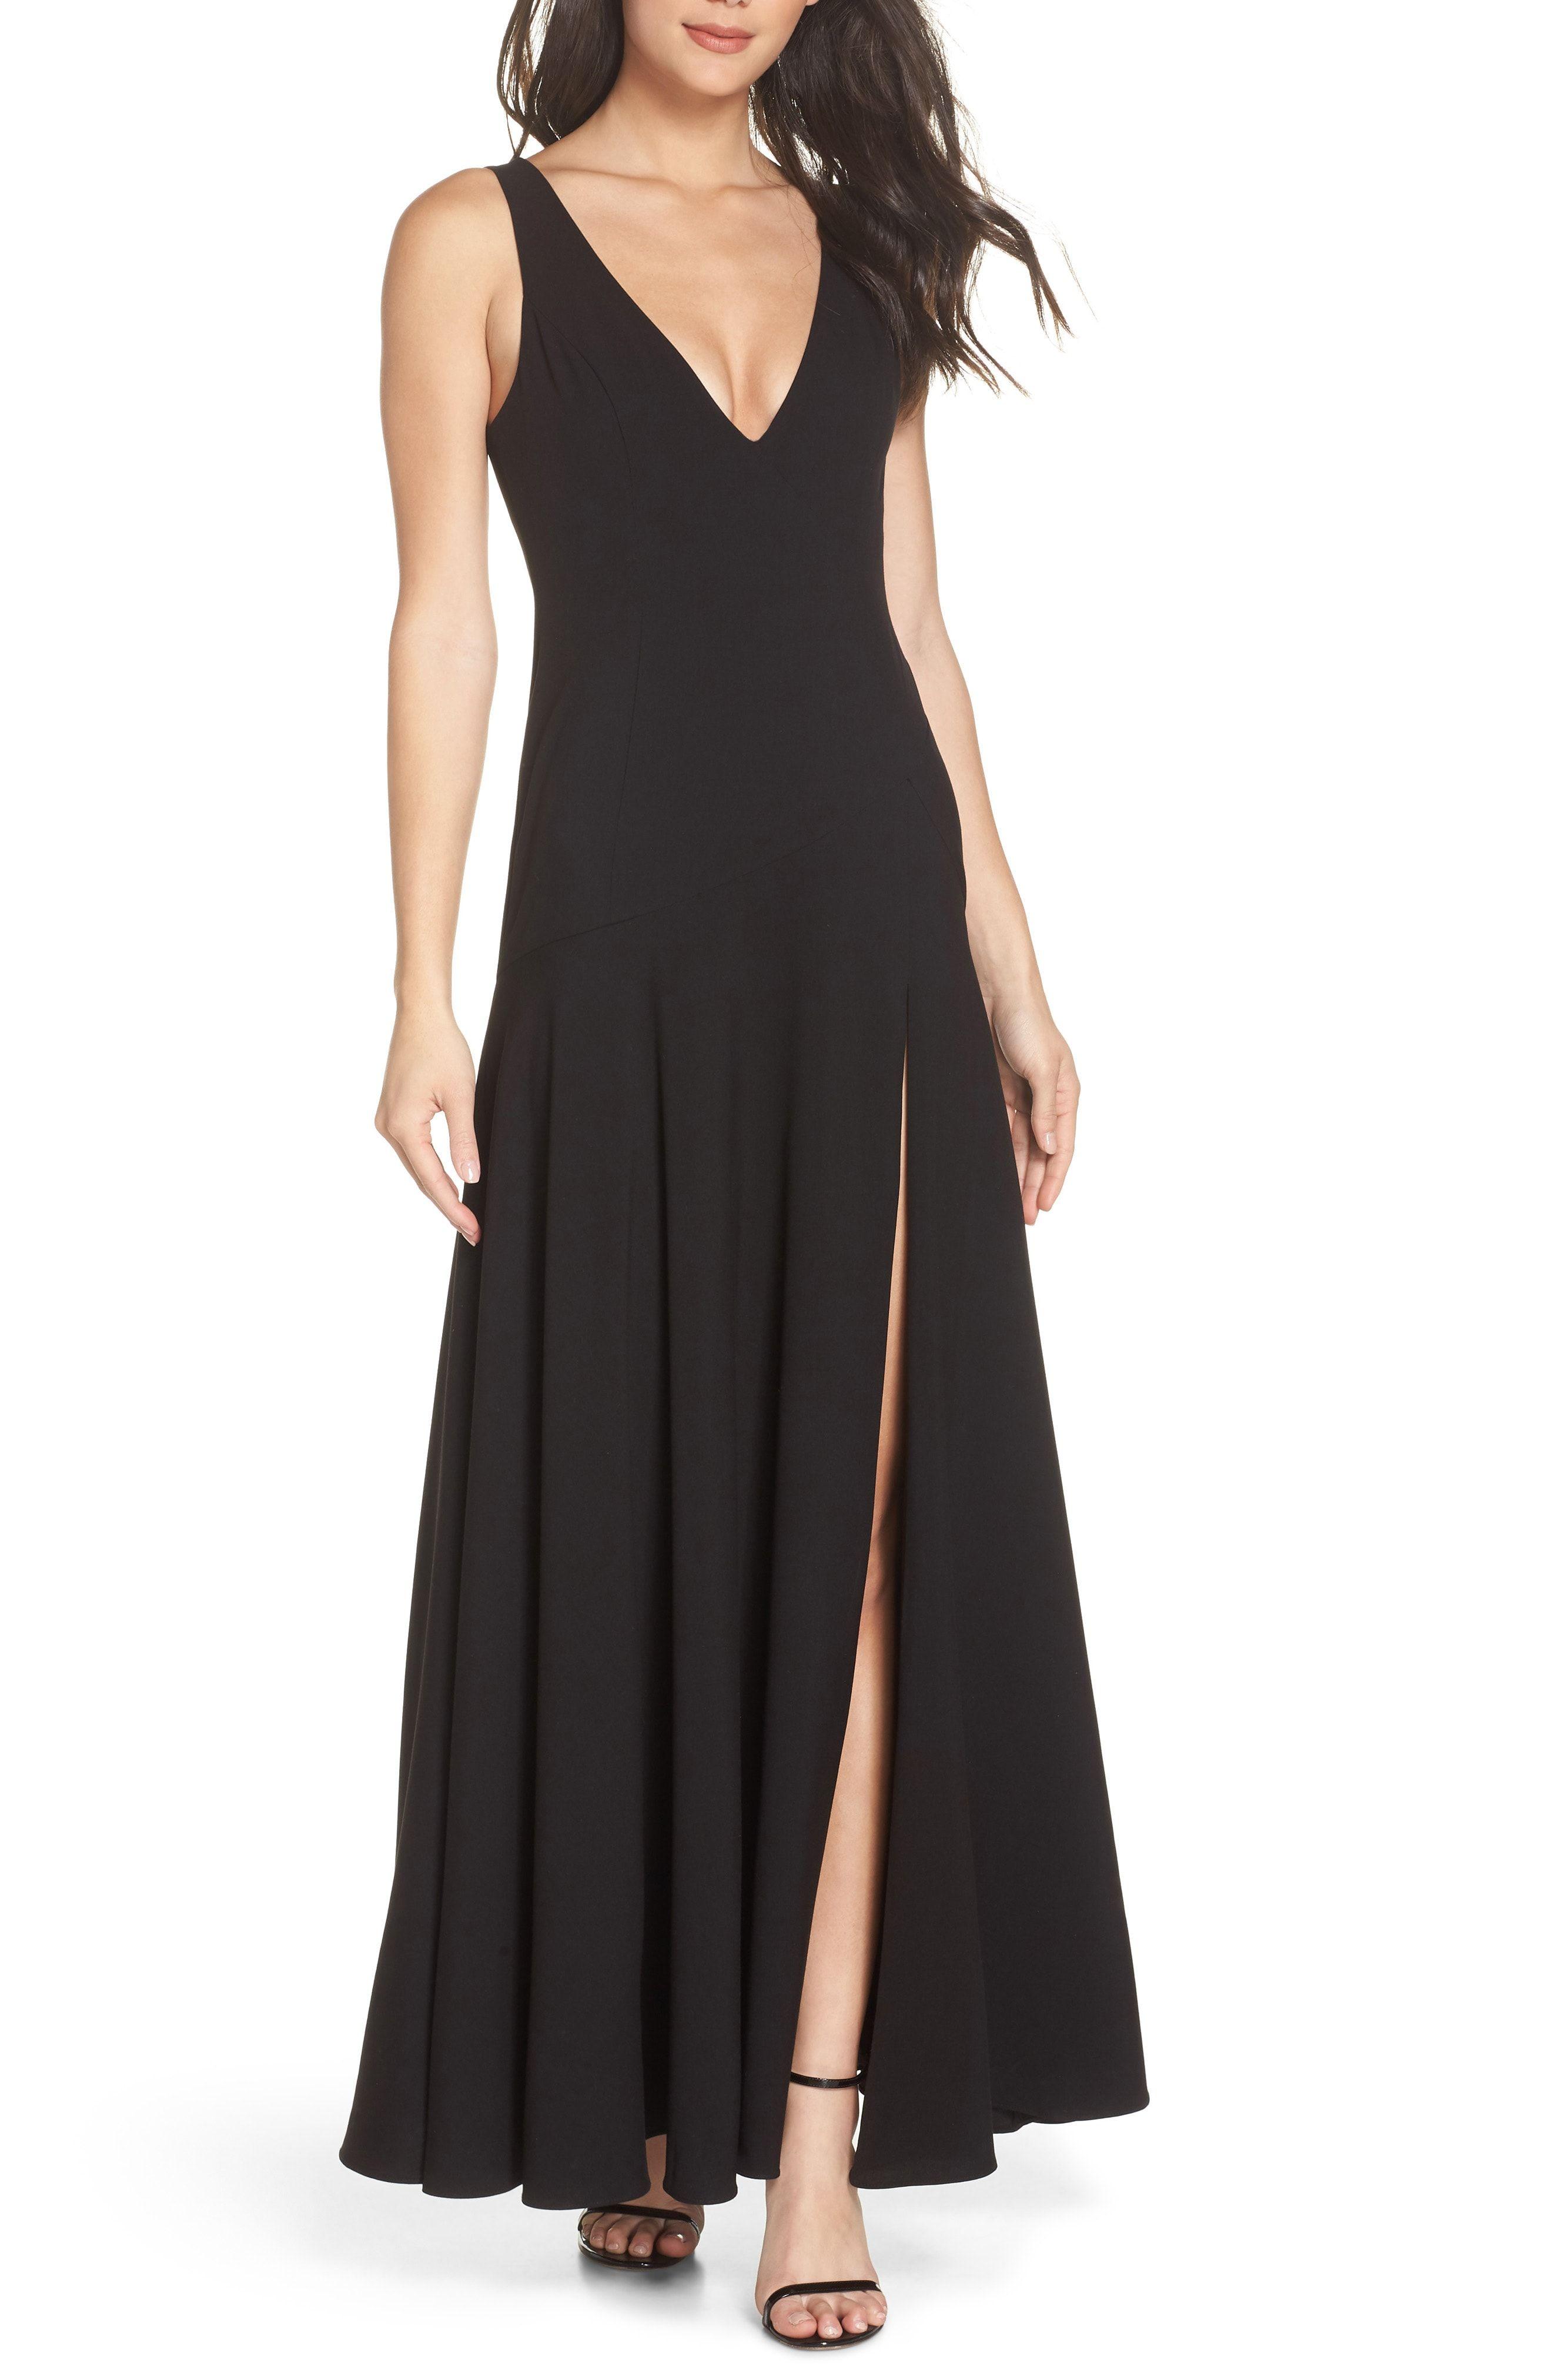 New fame partners the hazel front slit gown online